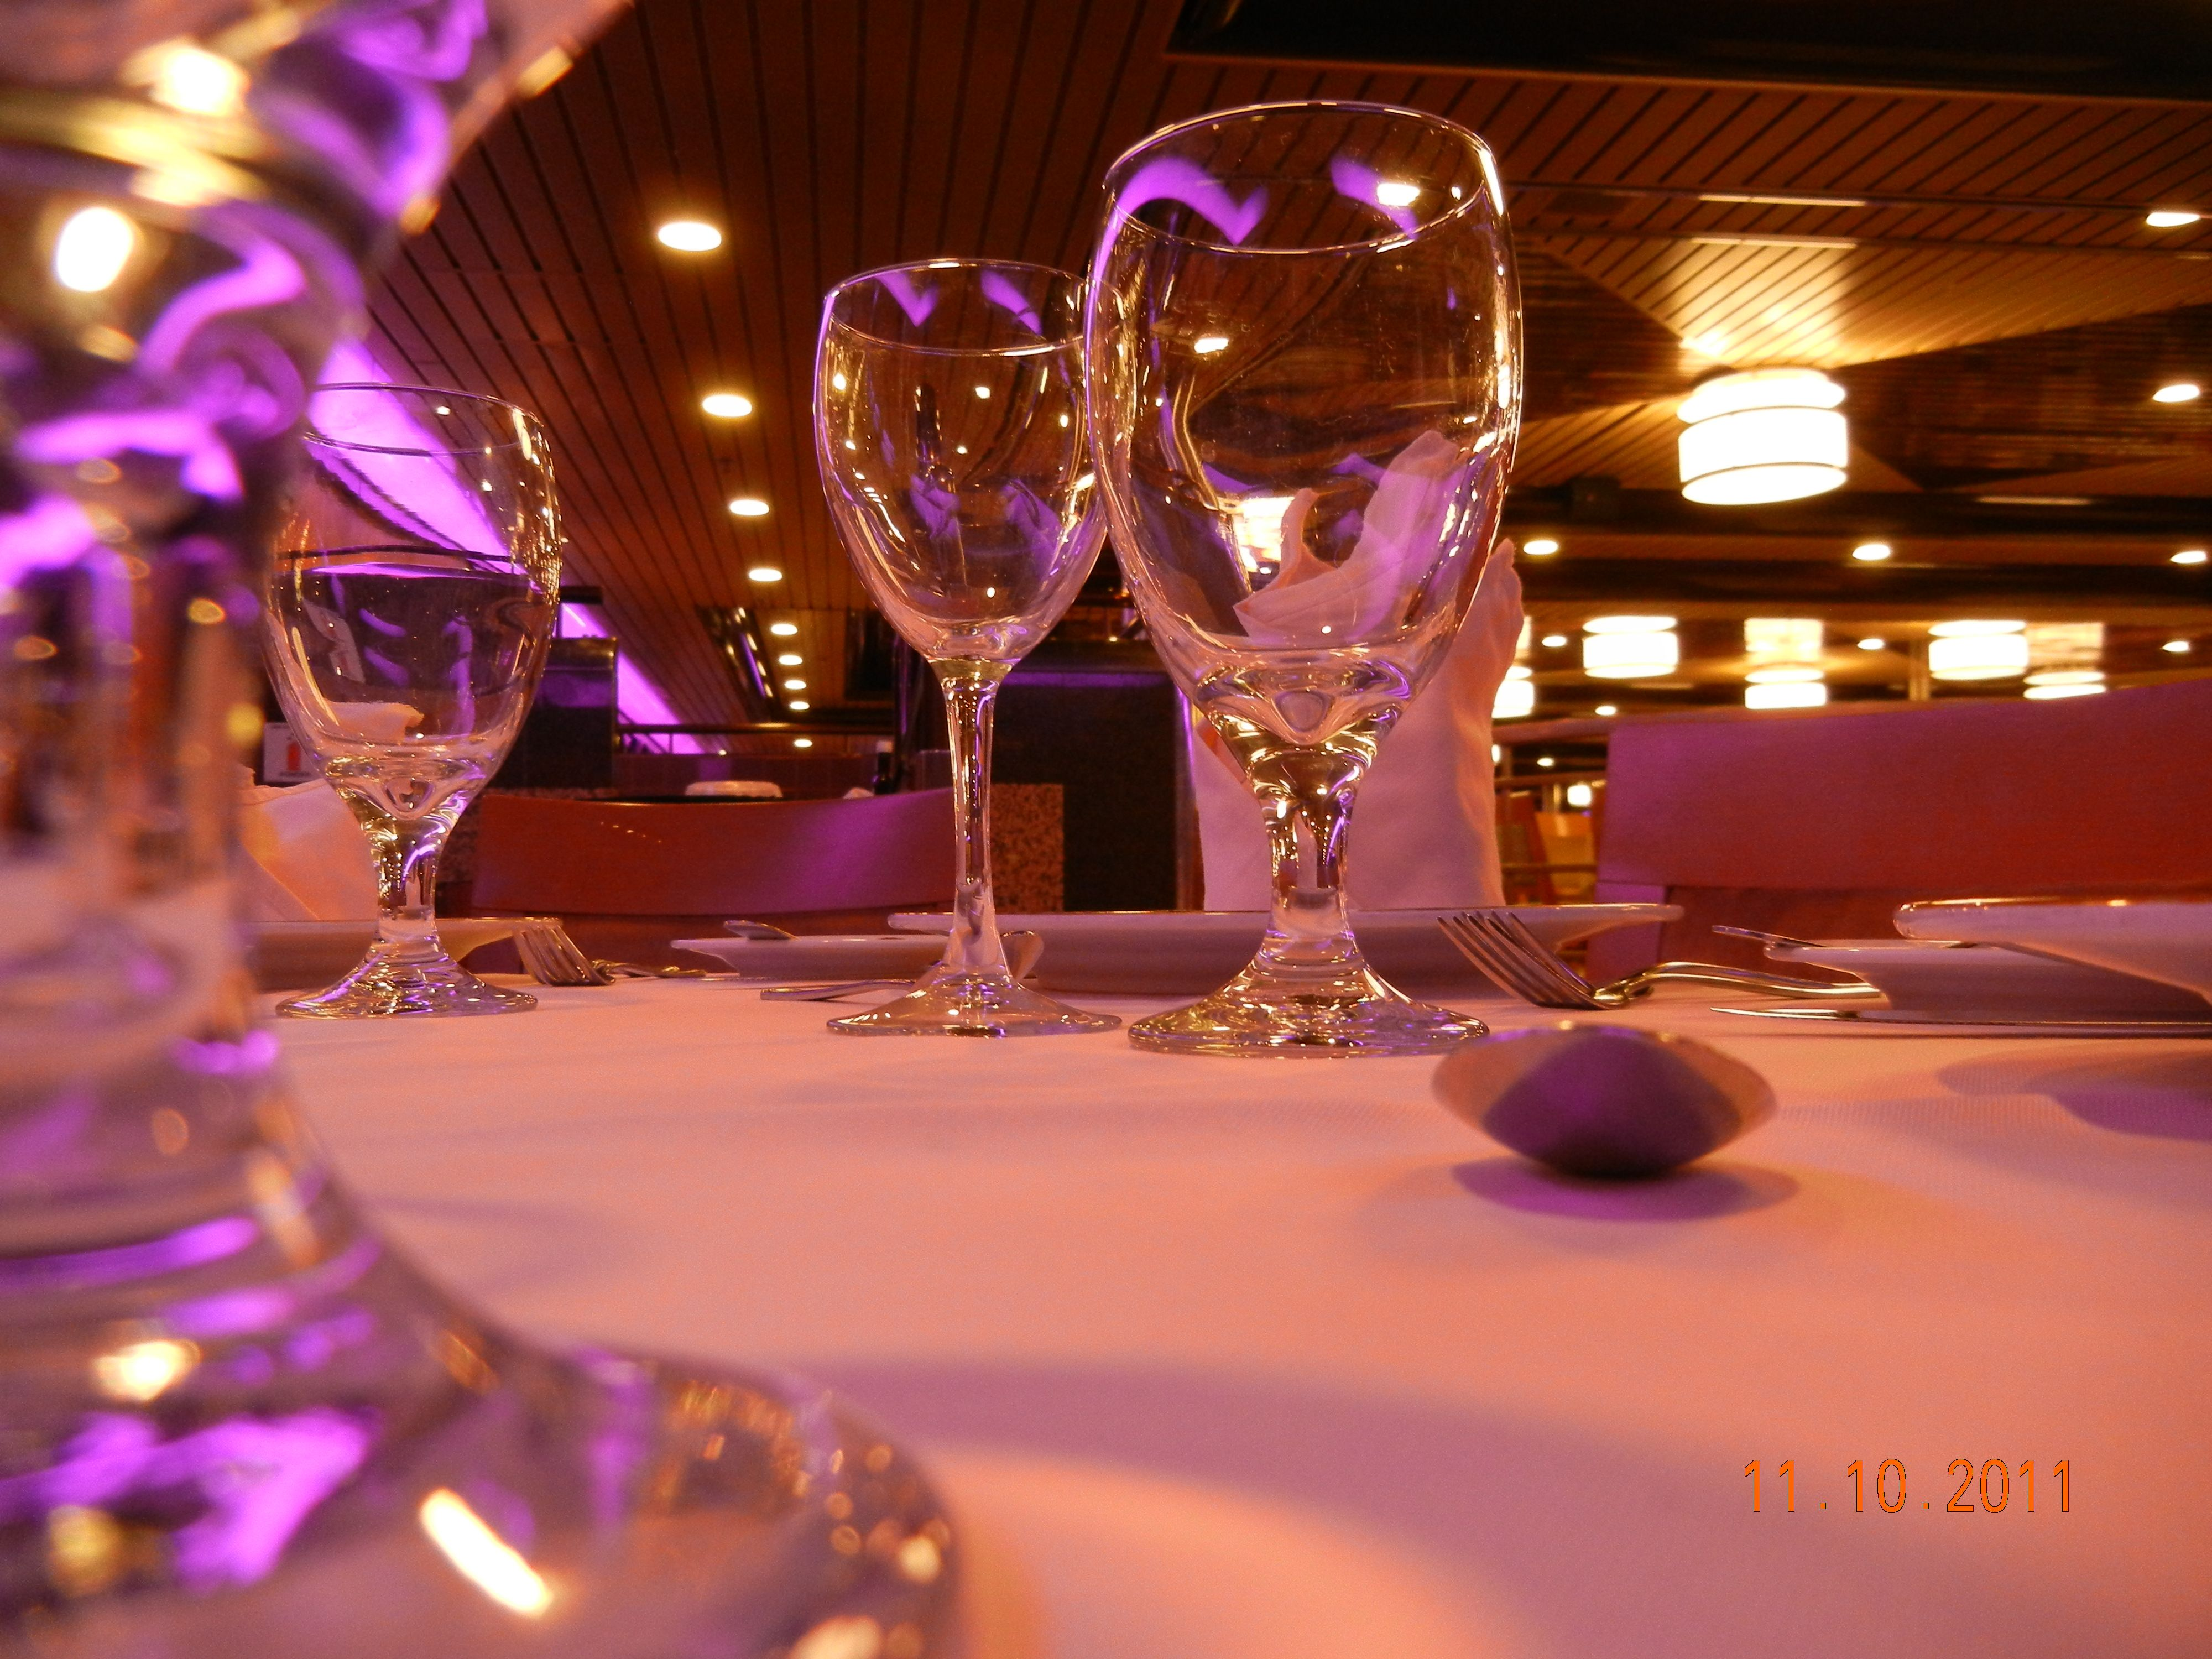 Bahamas Cruise Ship-dinner (: